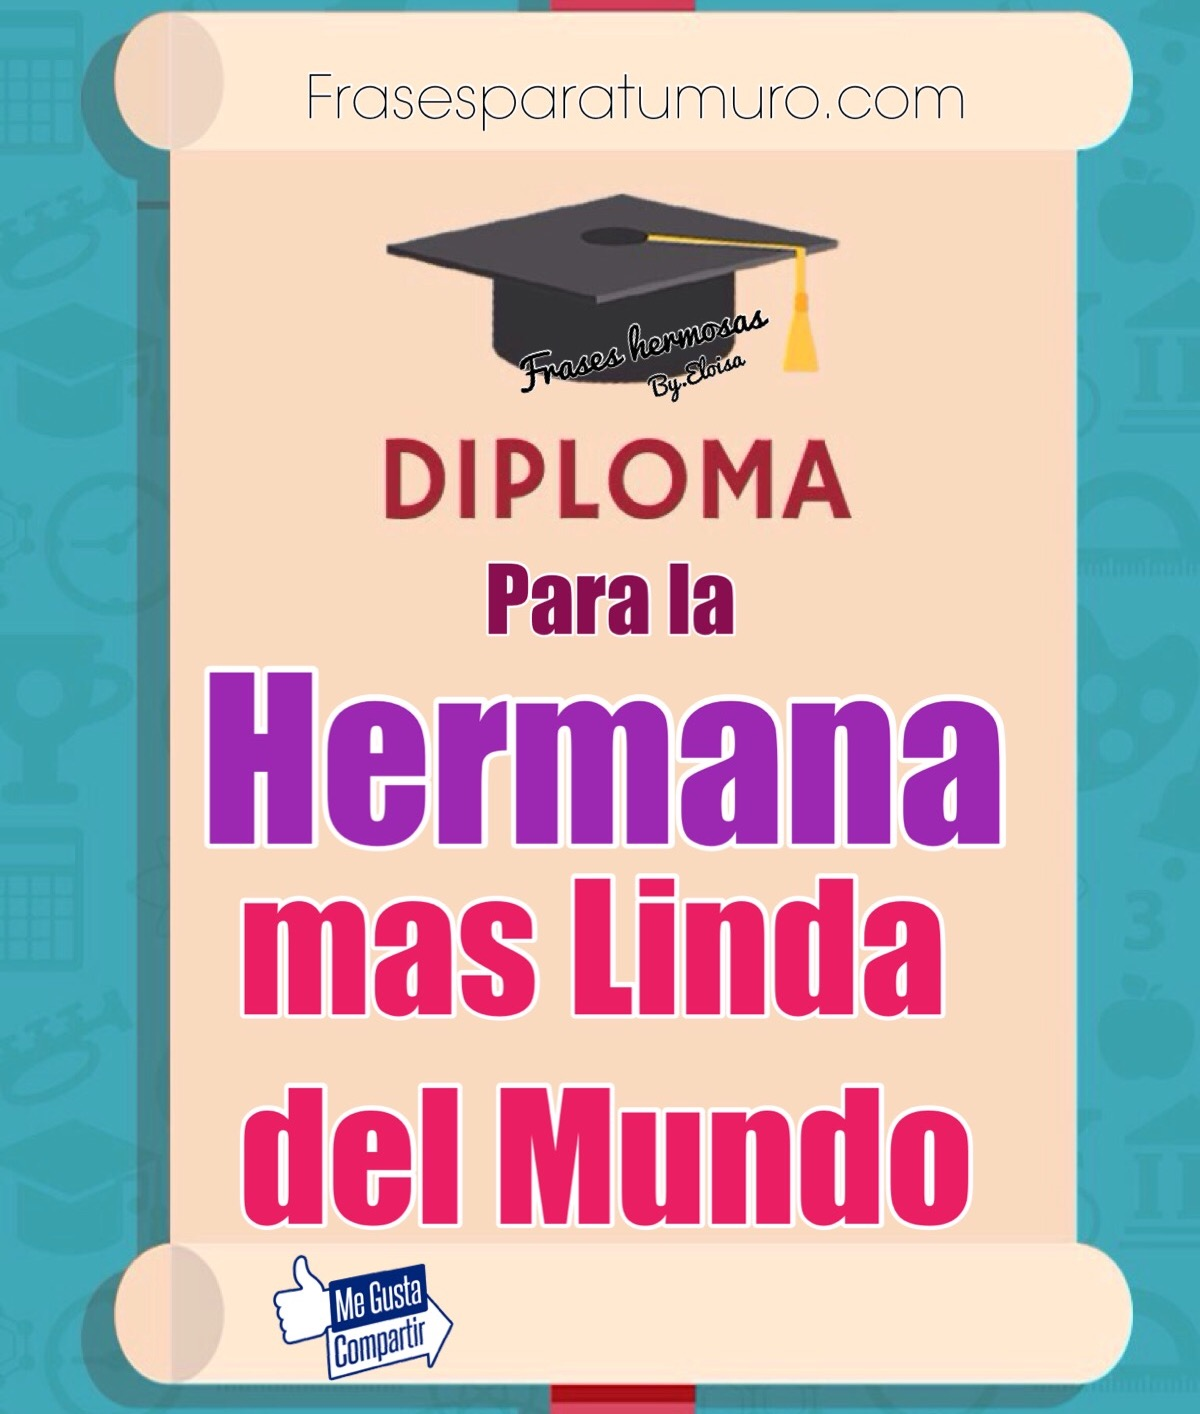 FrasesparatuMuro.com: Diploma para la mas Linda del mundo